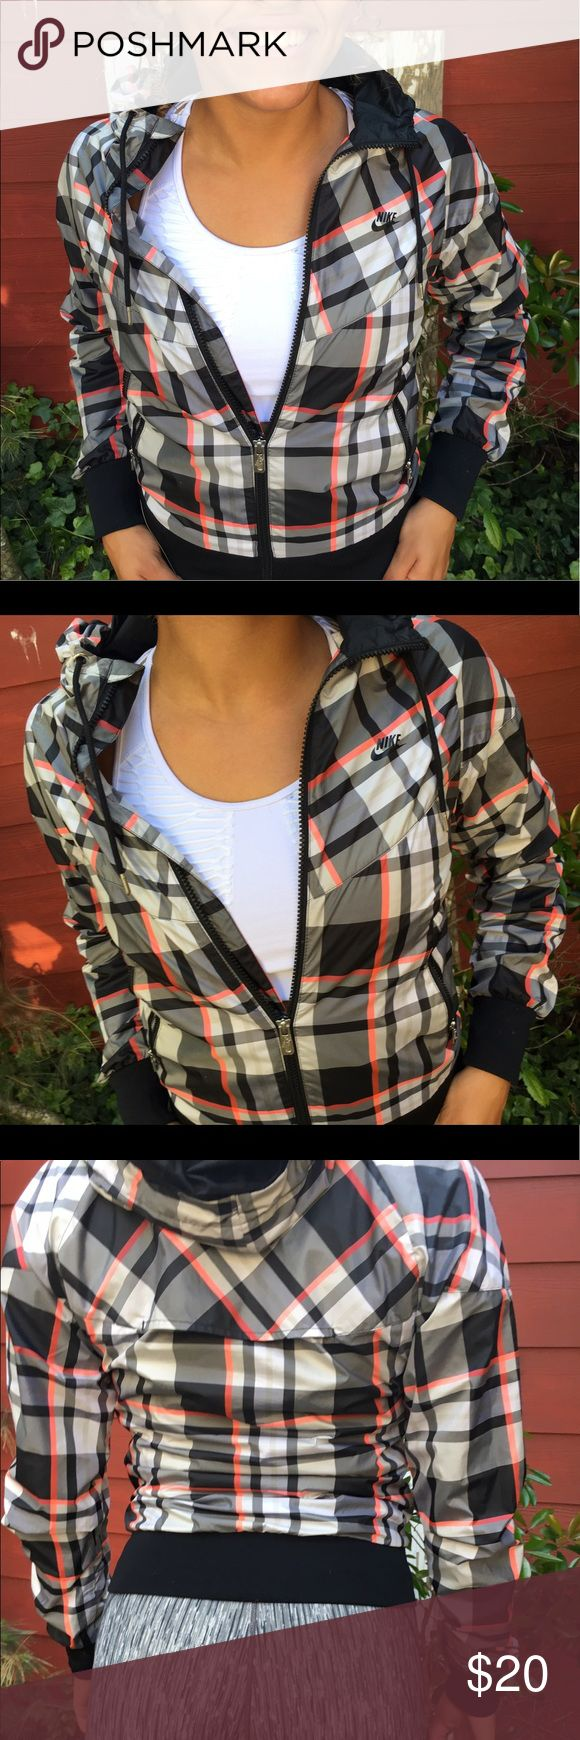 Plaid Nike rain jacket✨ Nike sportswear plaid jacket with mesh lining and drawstring hood. 2 usable pockets. Perfect condition. Nike Jackets & Coats Utility Jackets